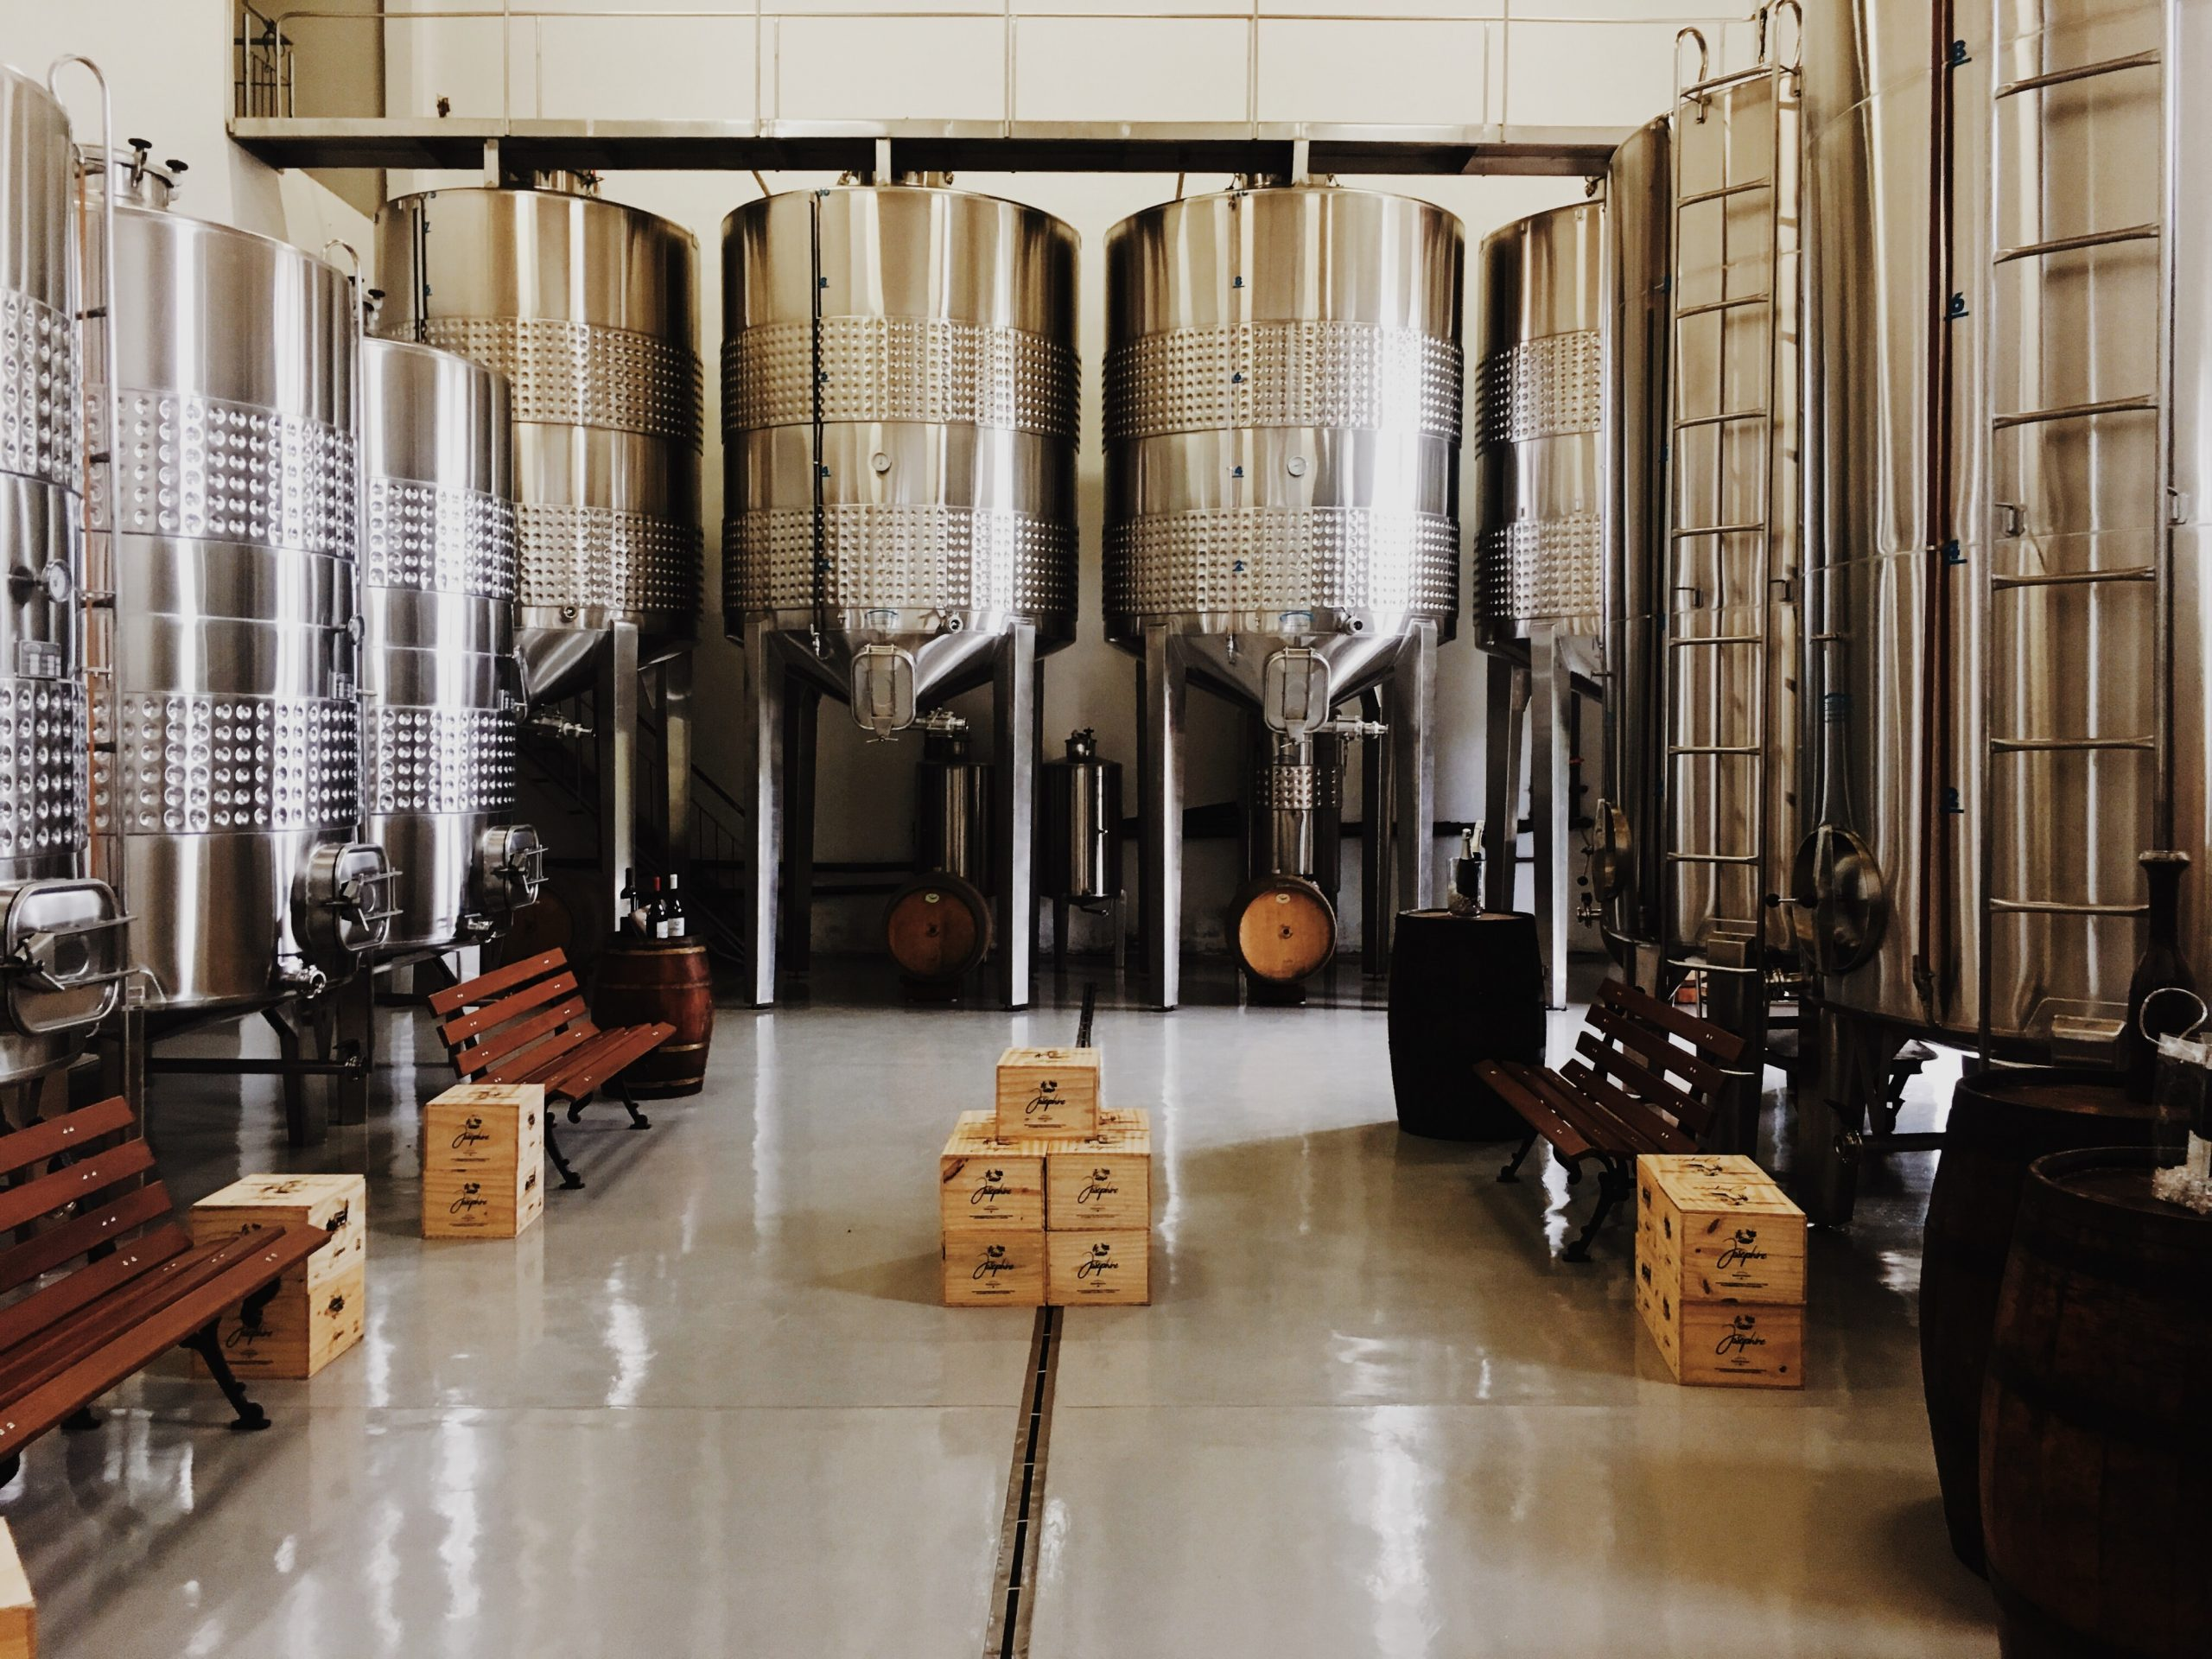 Image of Craft Beer brewing Industry